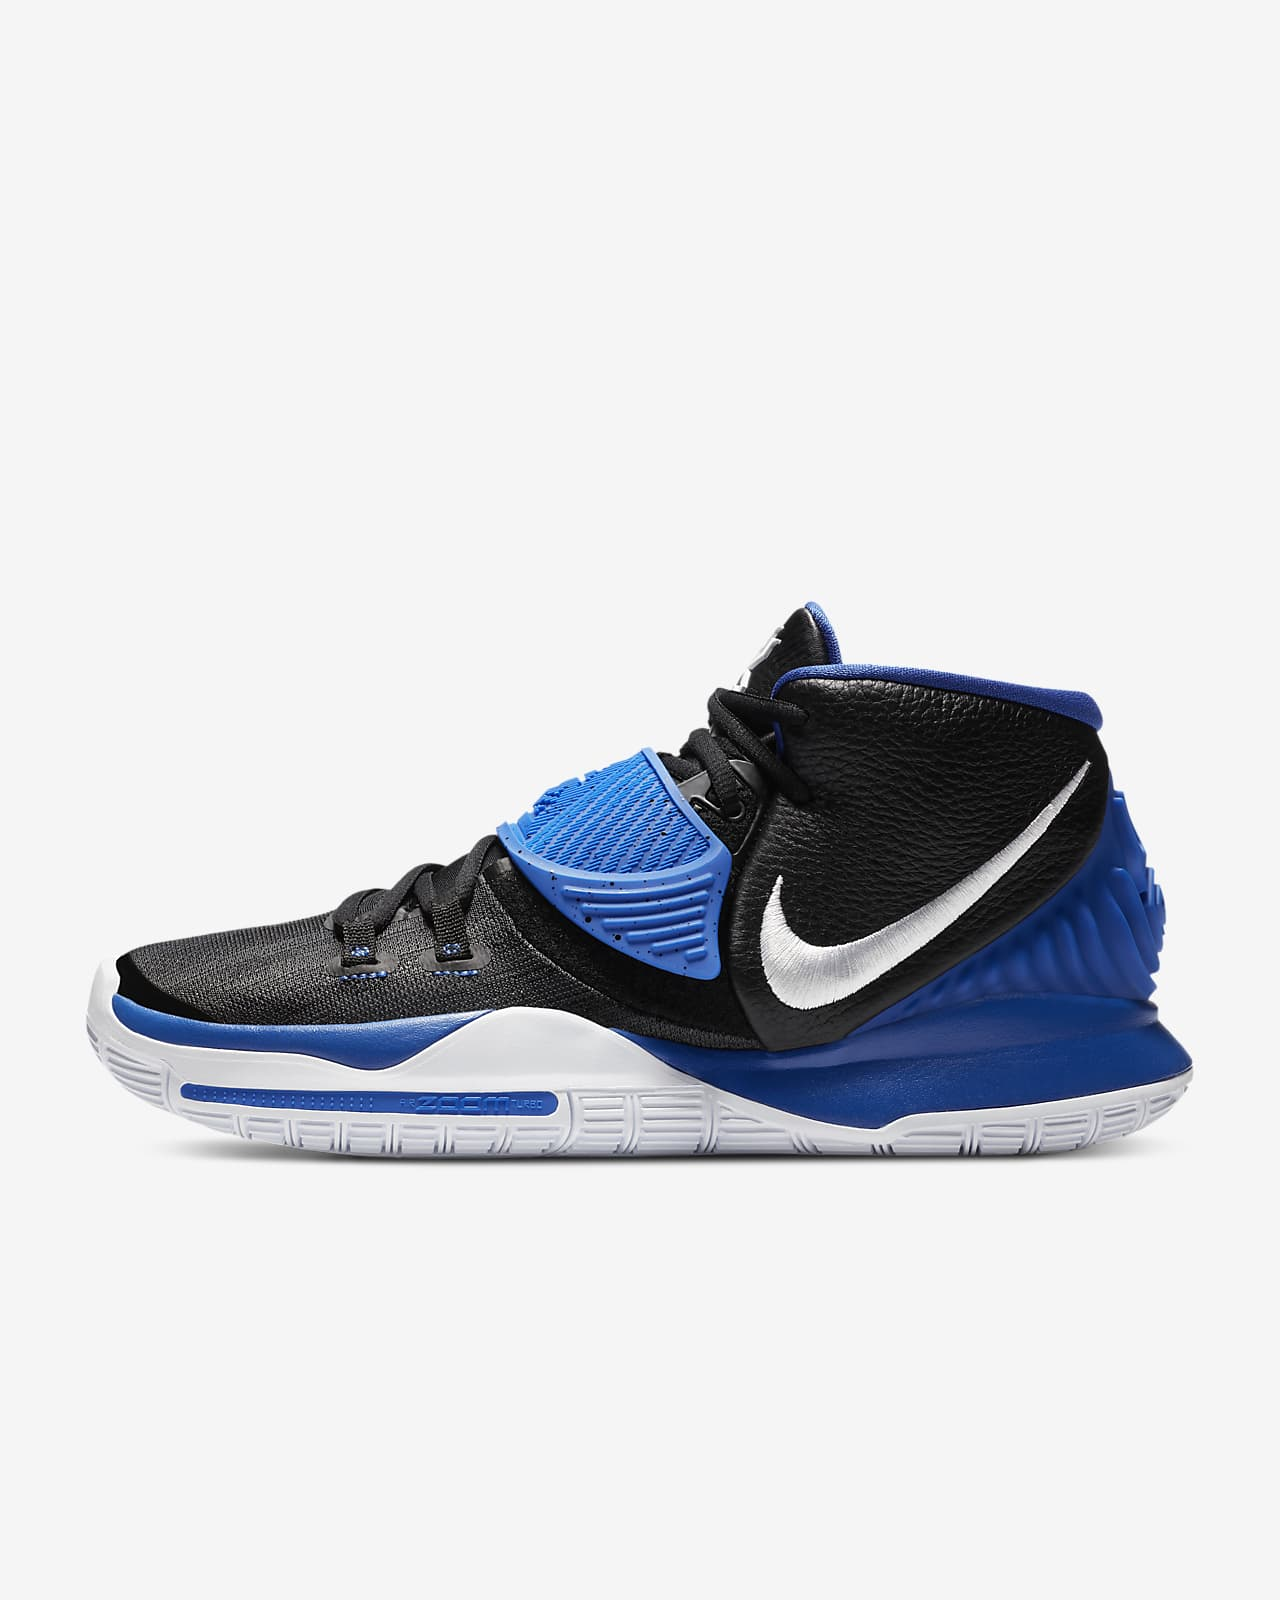 Kyrie 6 (Team) Basketball Shoe